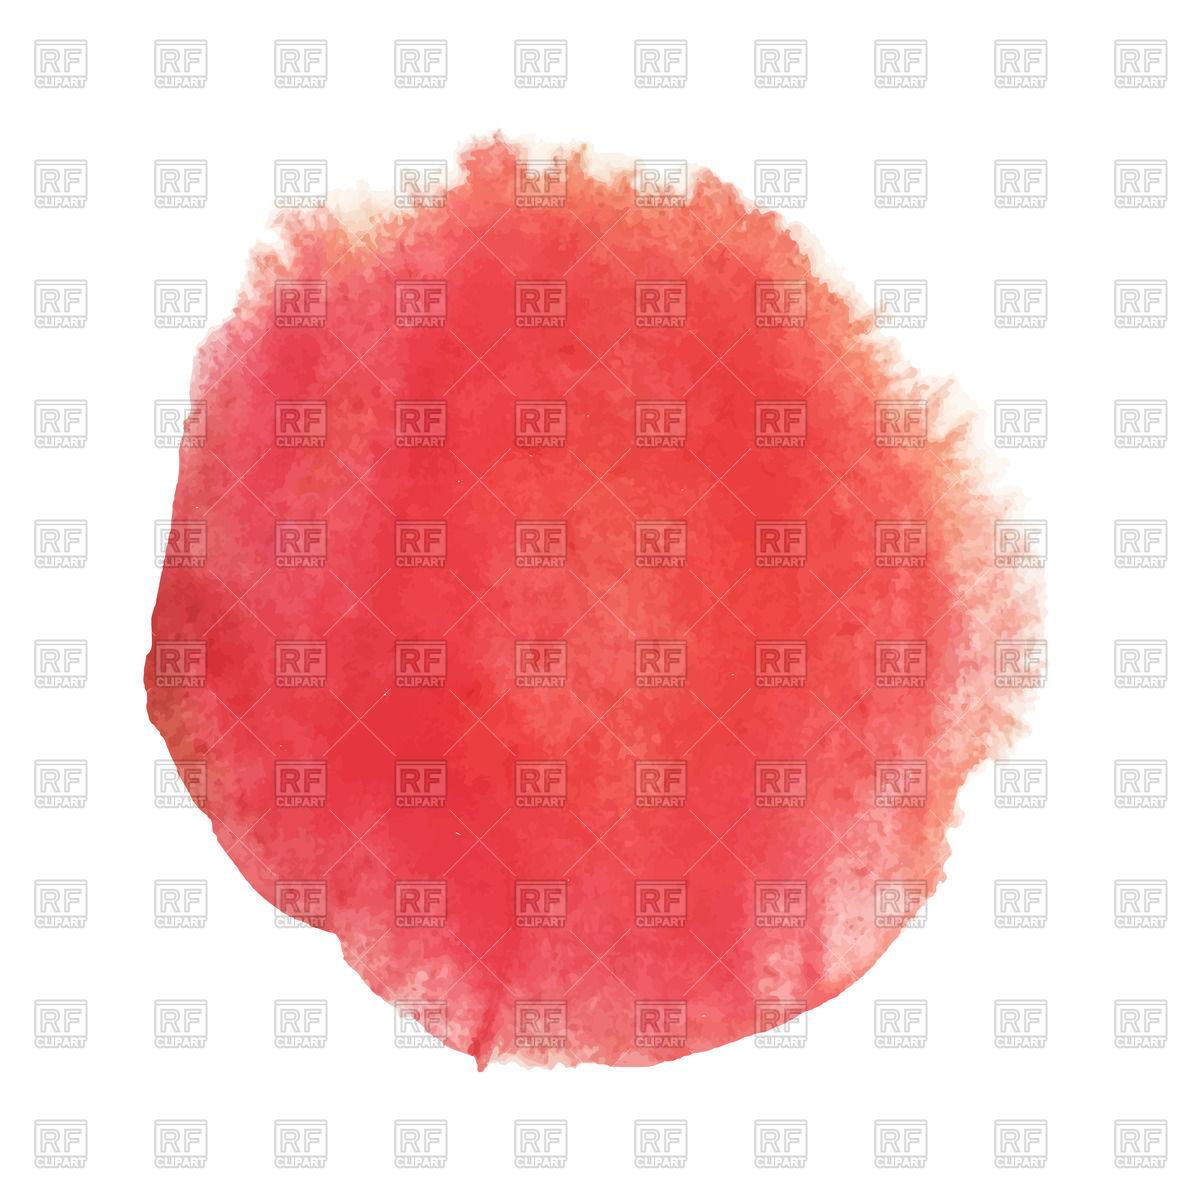 Bright red watercolor circle Vector Image #44576.